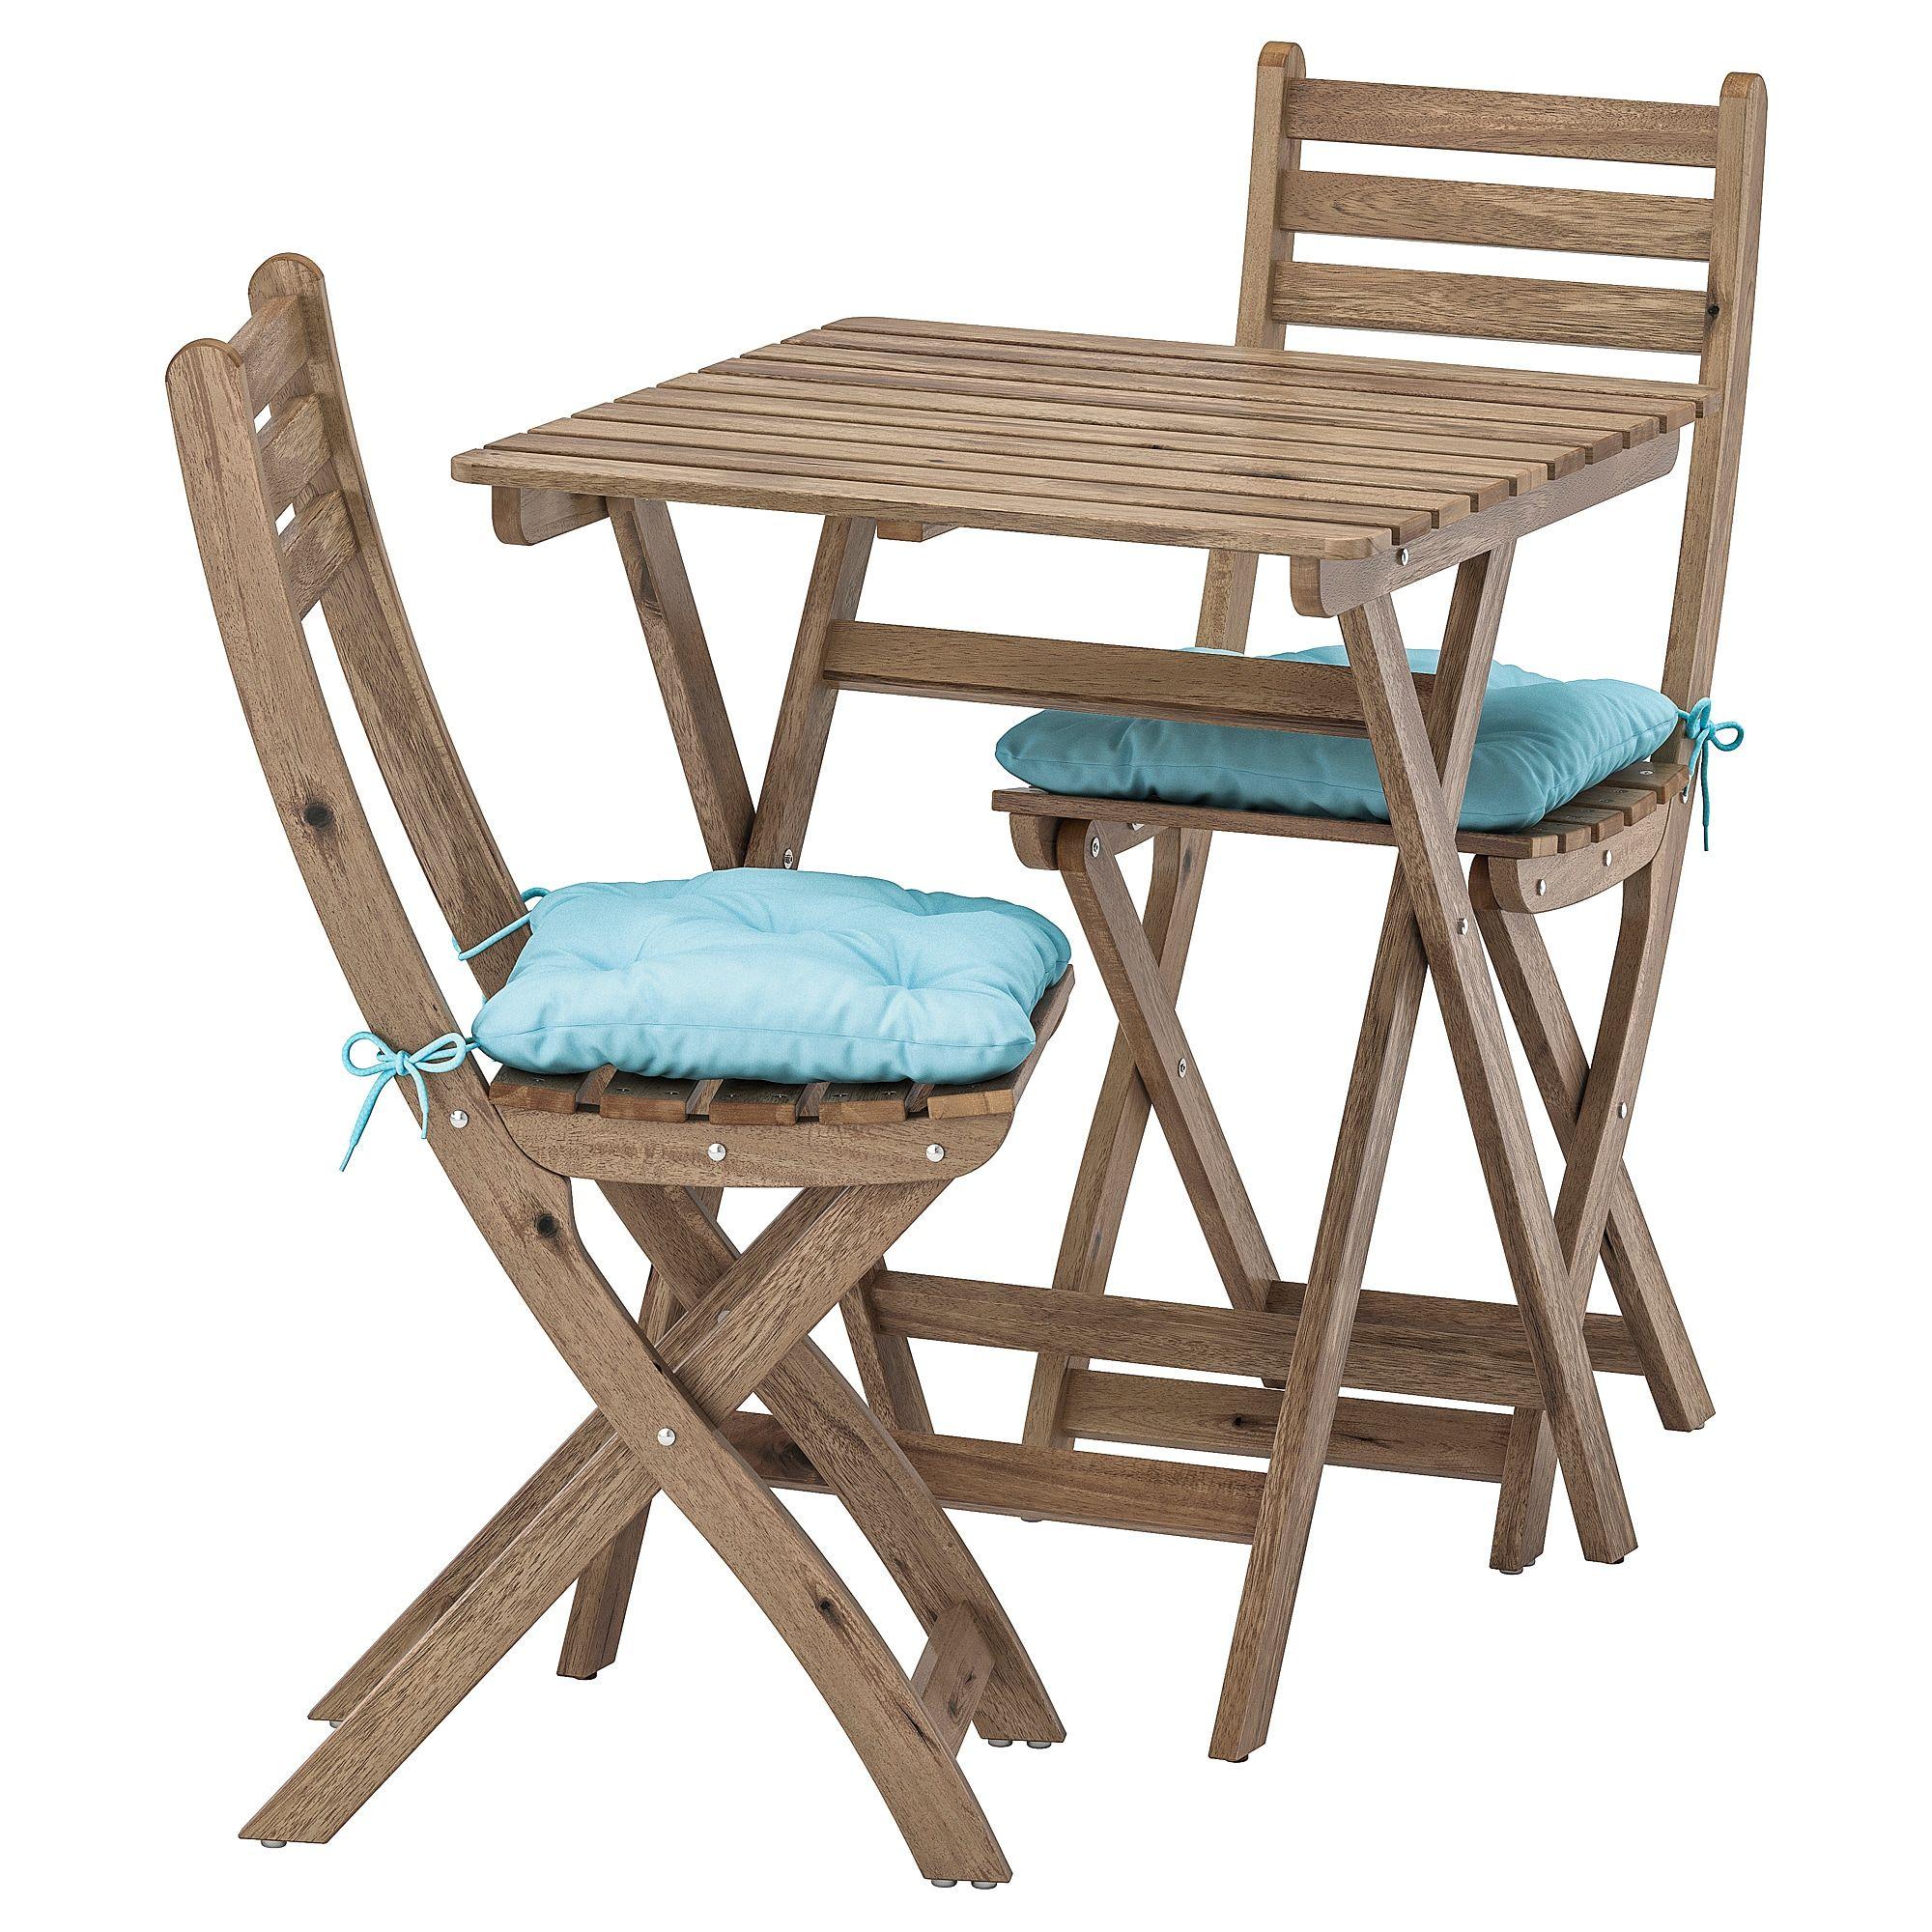 Askholmen Tisch 2 Stuhle Aussen Graubraun Lasiert Kuddarna